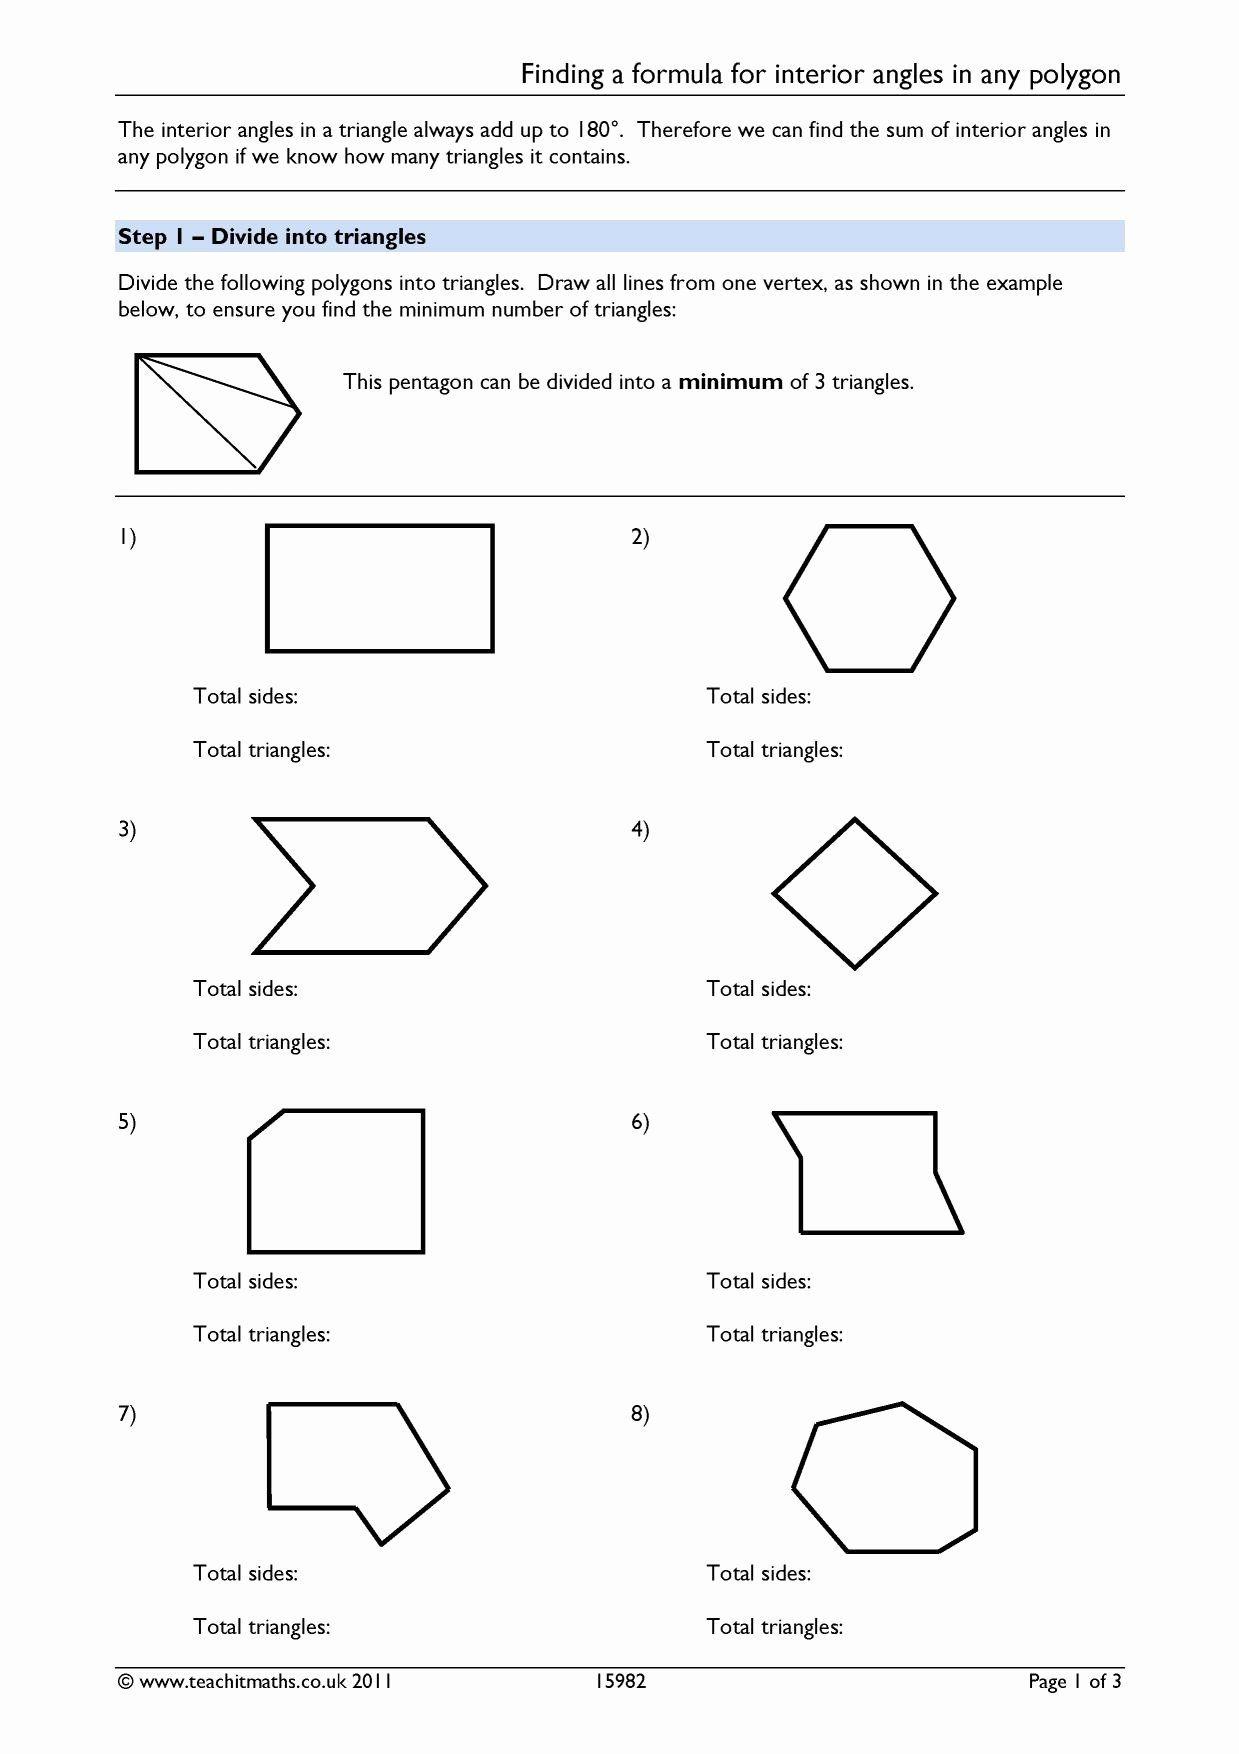 Polygon And Angles Worksheet Elegant Worksheet Interior